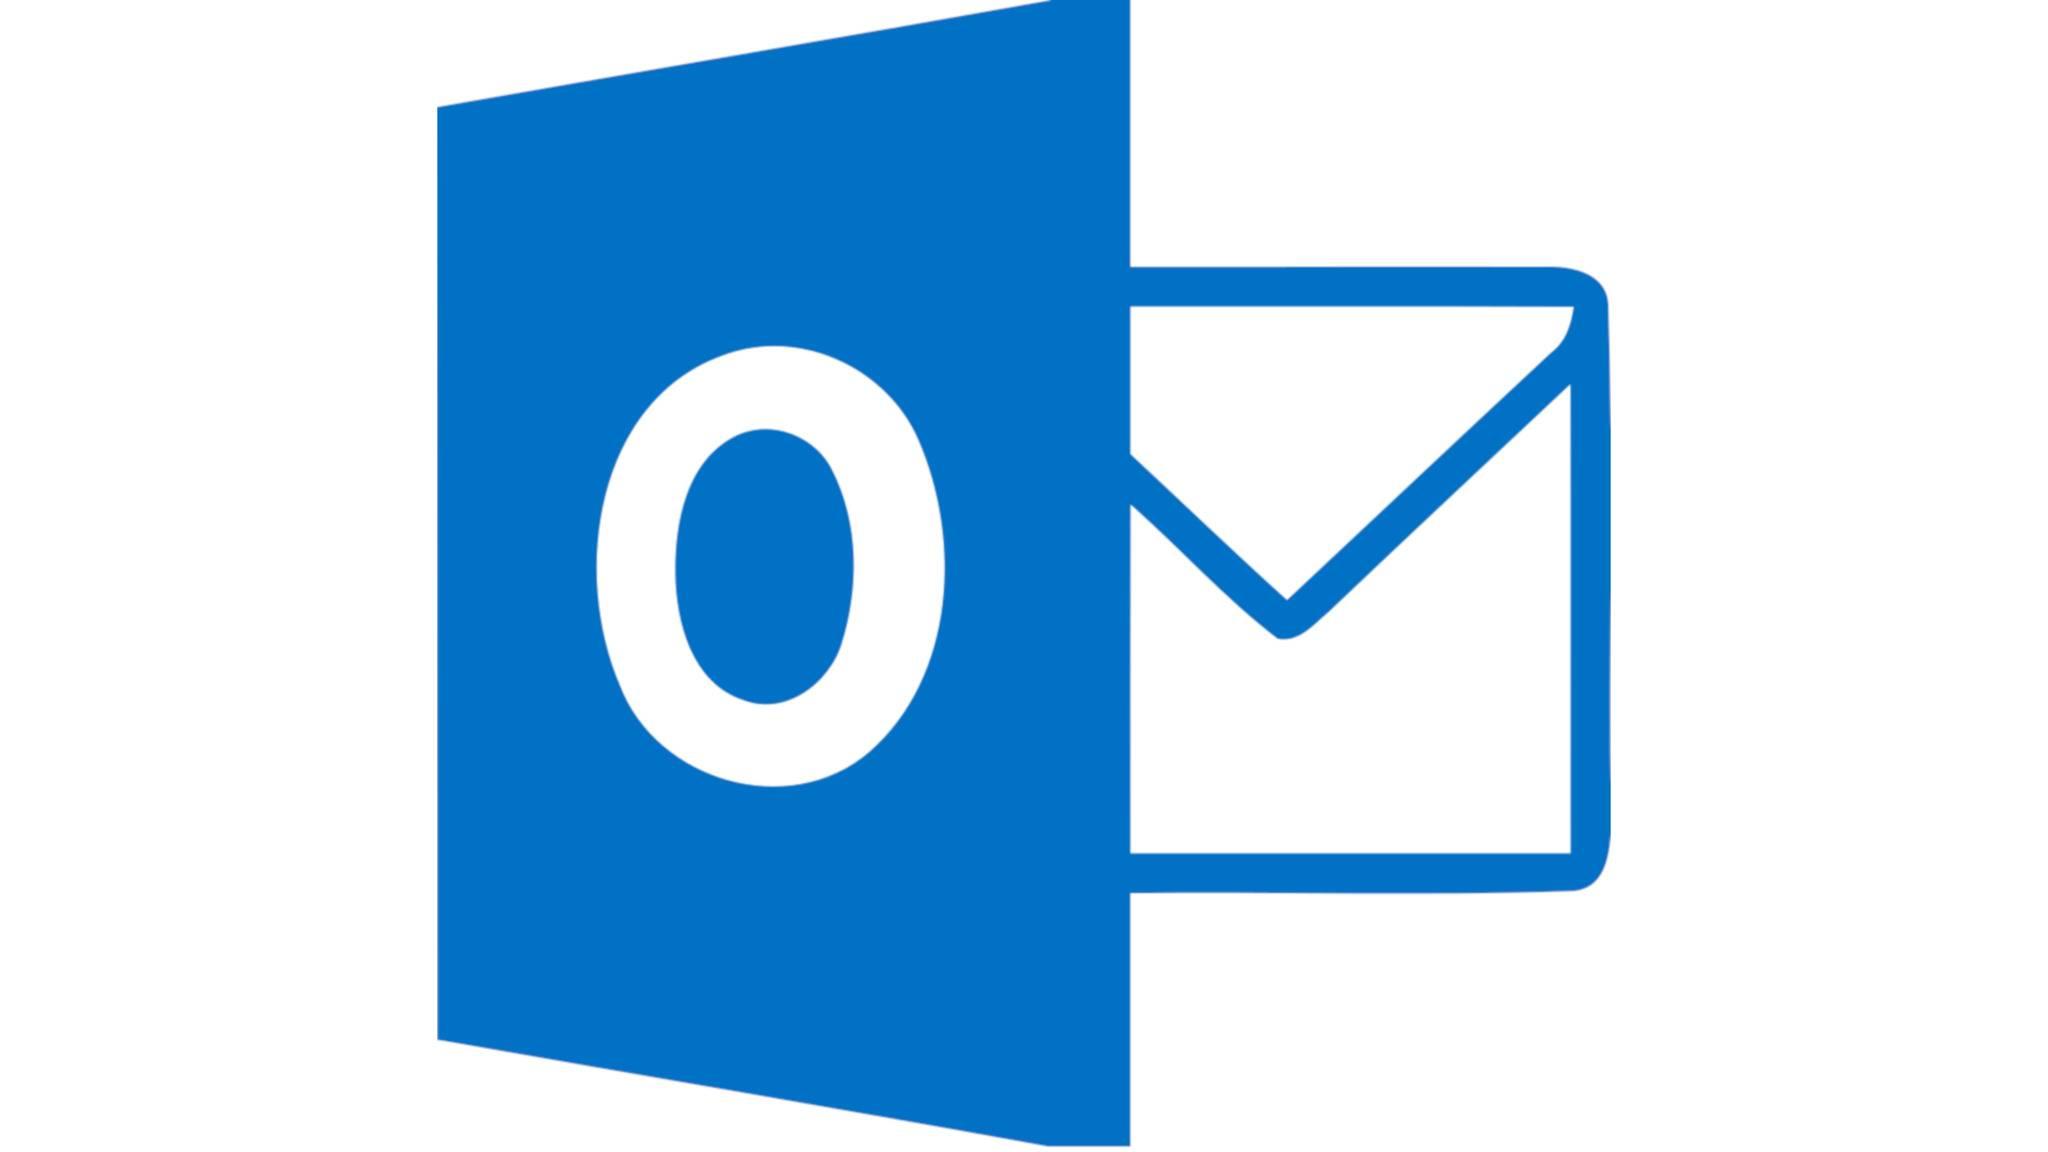 Unbefugte hatten drei Monate lang Zugang zu Nutzerdaten in Outlook.